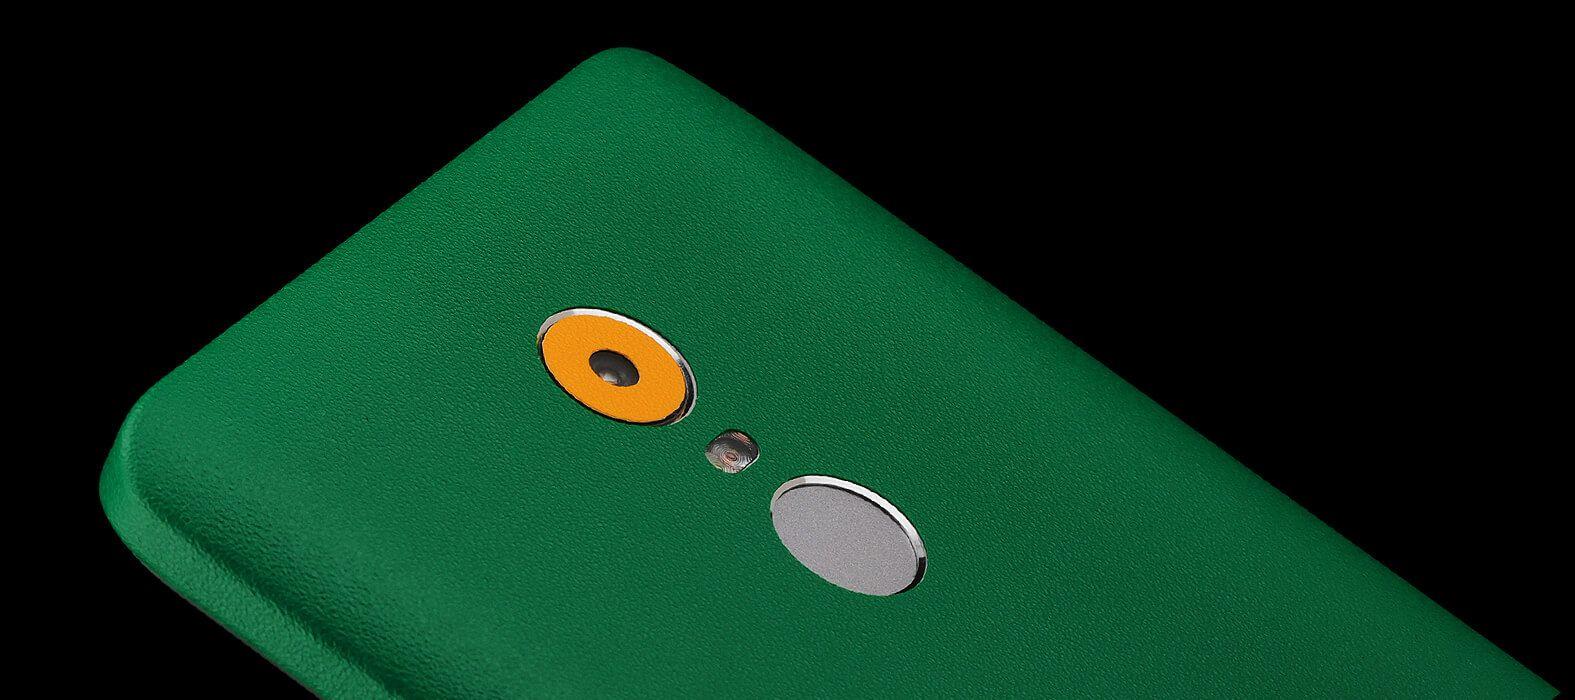 Sandstone Green Redmi Note 4 Wraps & Skins